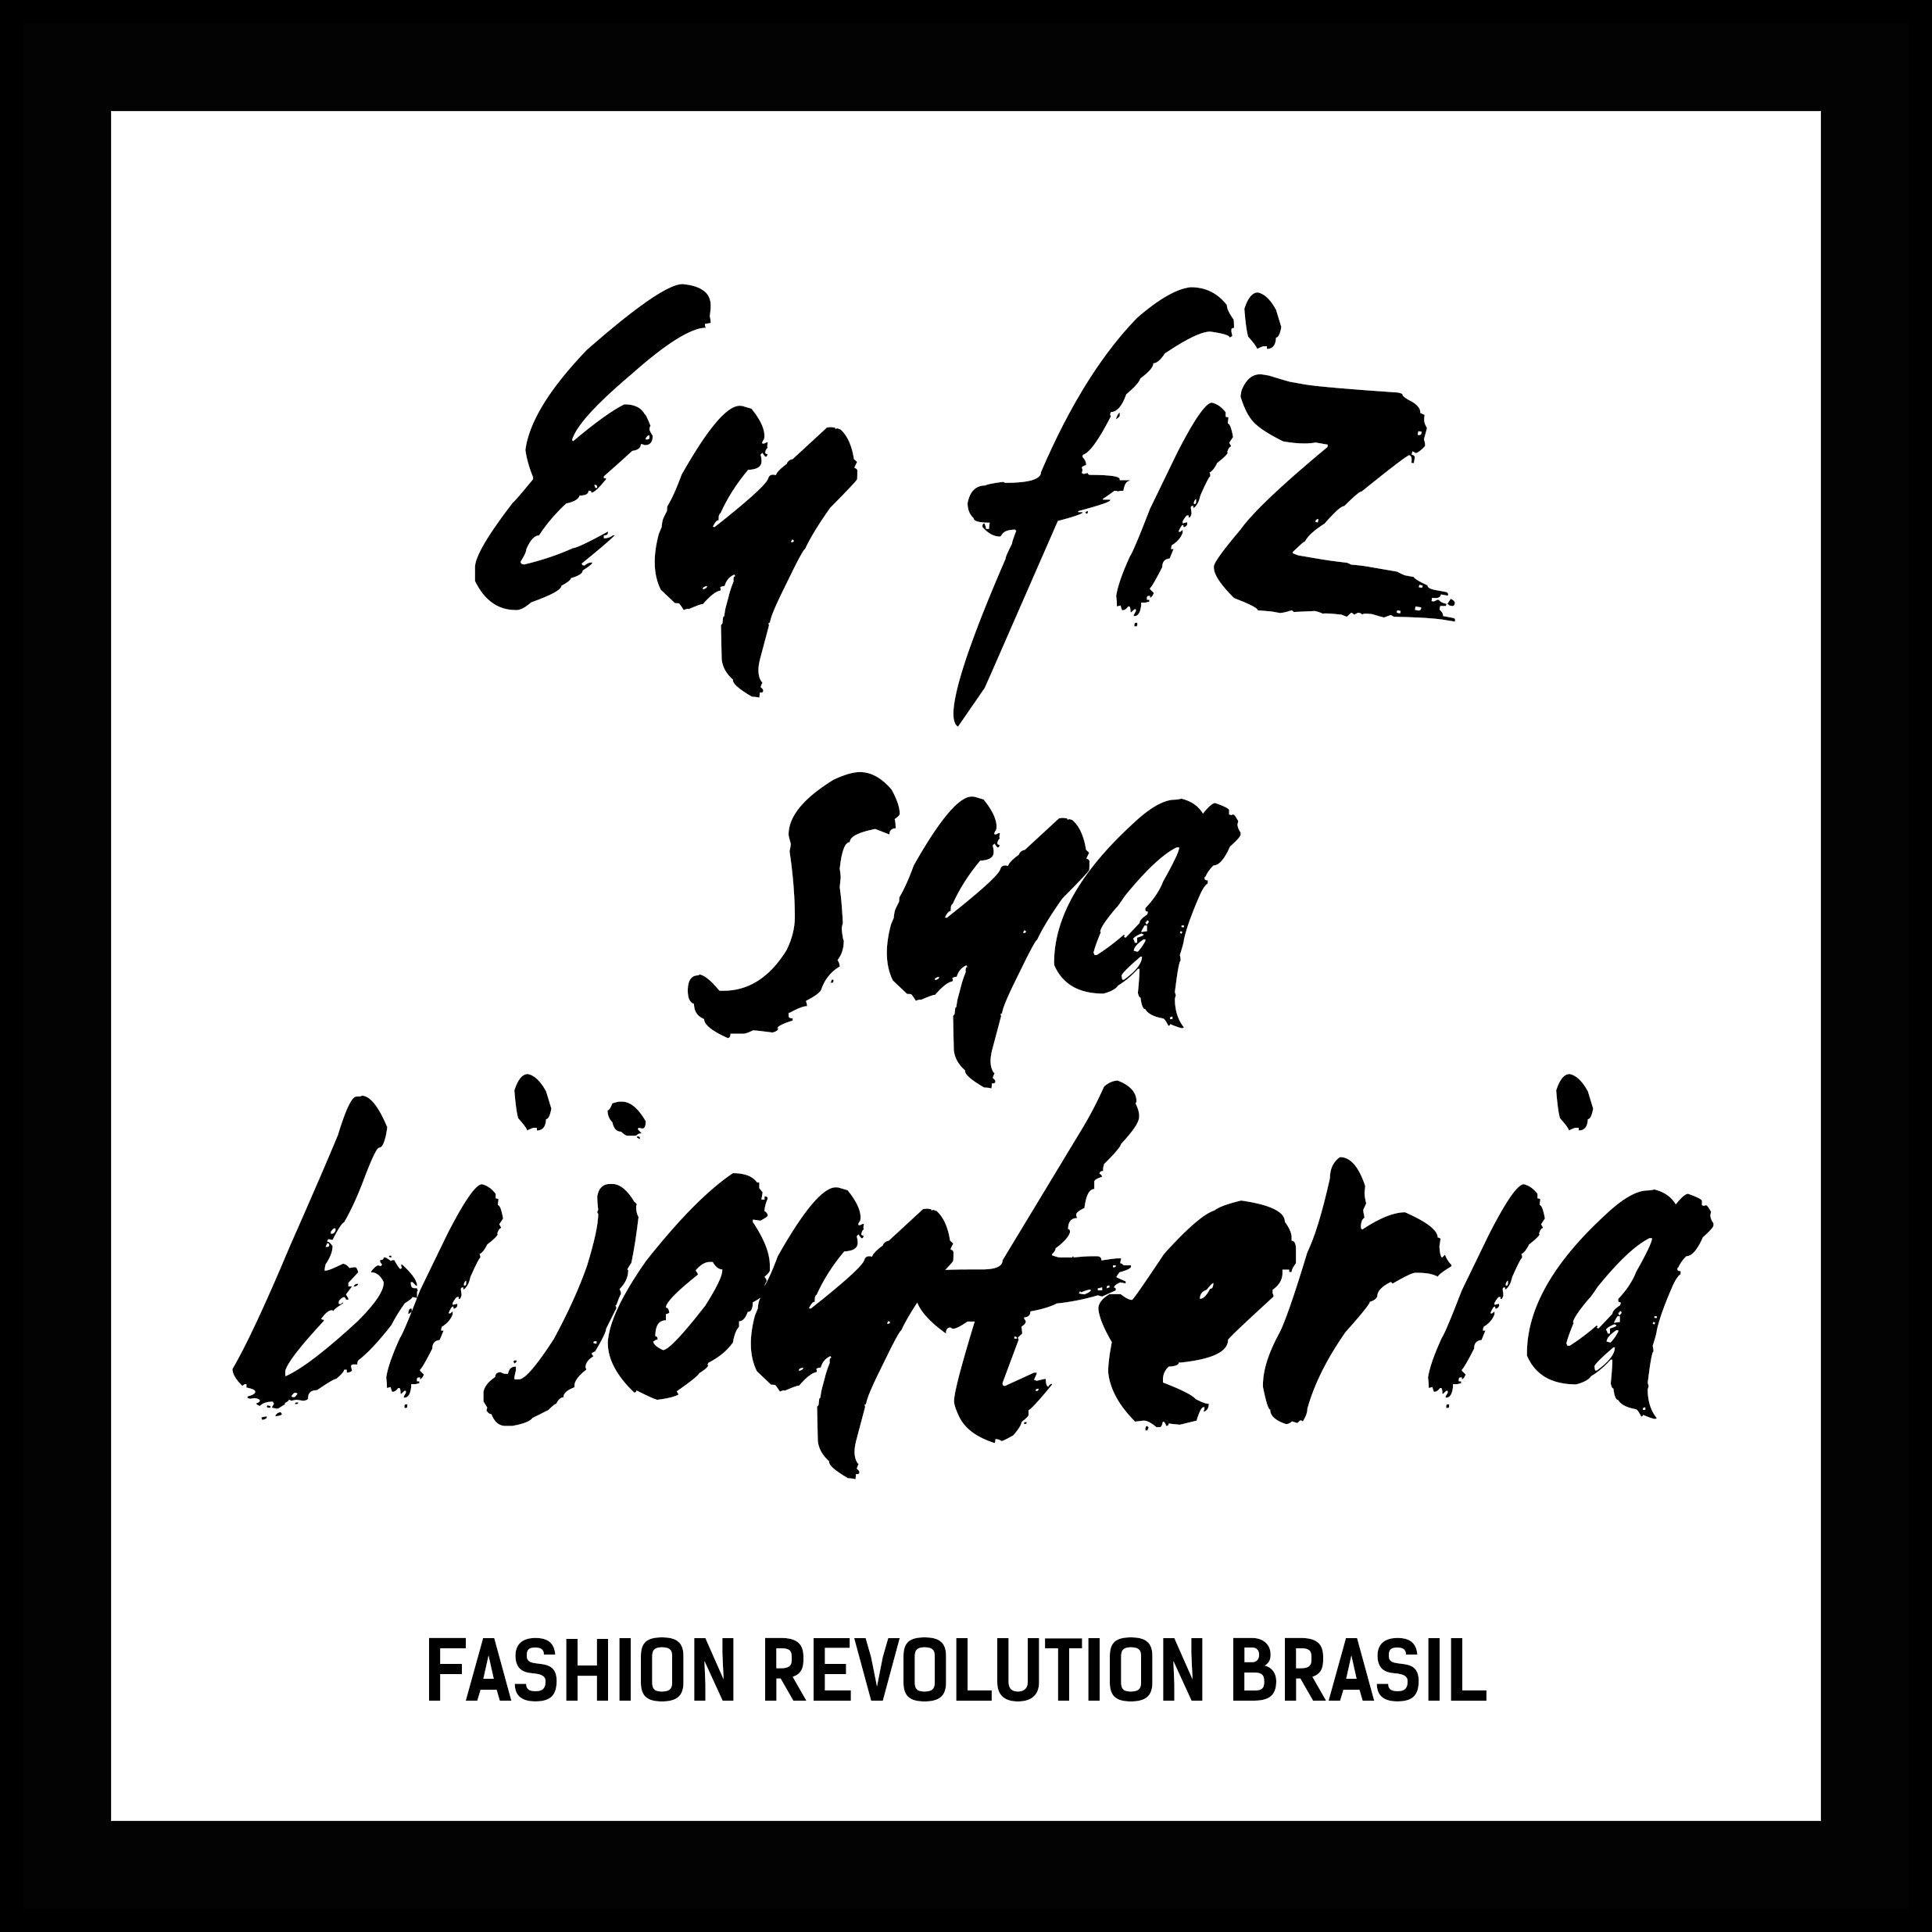 Fashionrevolution Quemfezminhasroupas Whomademyclothes Fashionrevolutionbrasil Sustainablefashion Sustentabi Moda Sustentavel Moda Etica Design De Moda